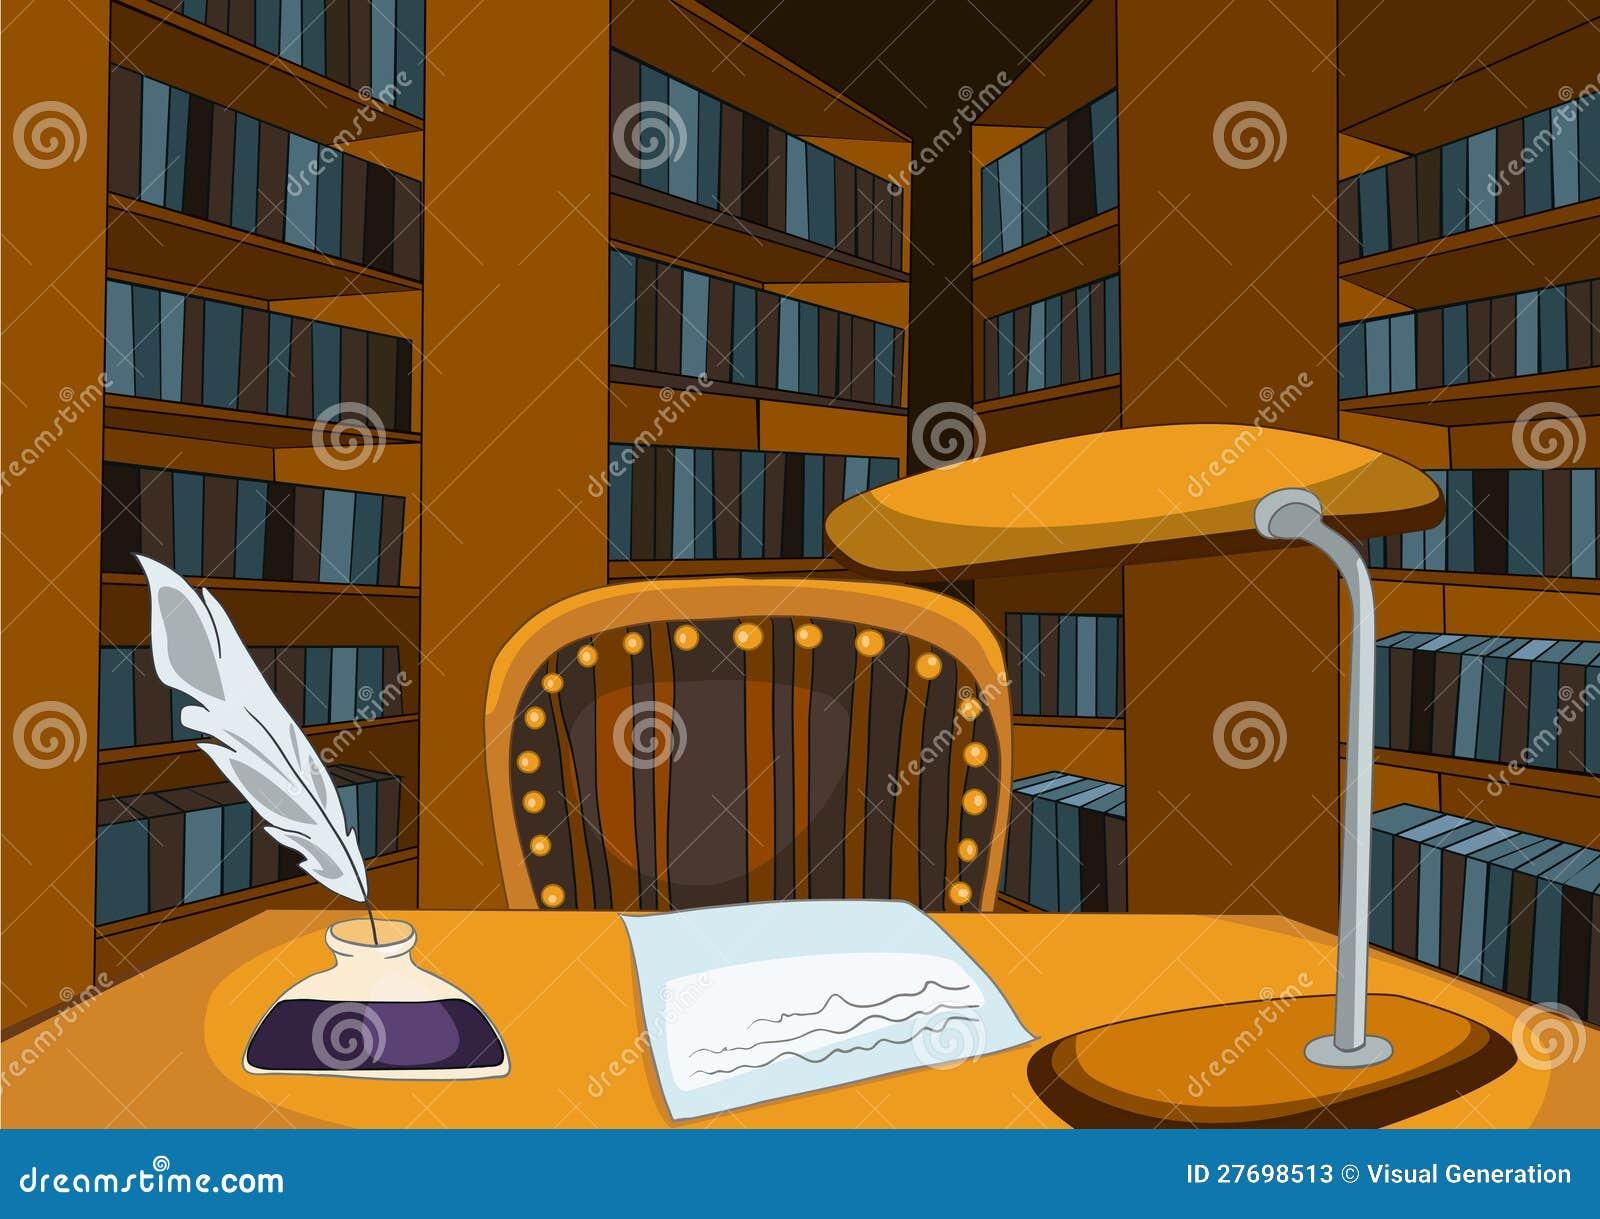 Library Room Cartoon Stock Photos - Image: 27698513